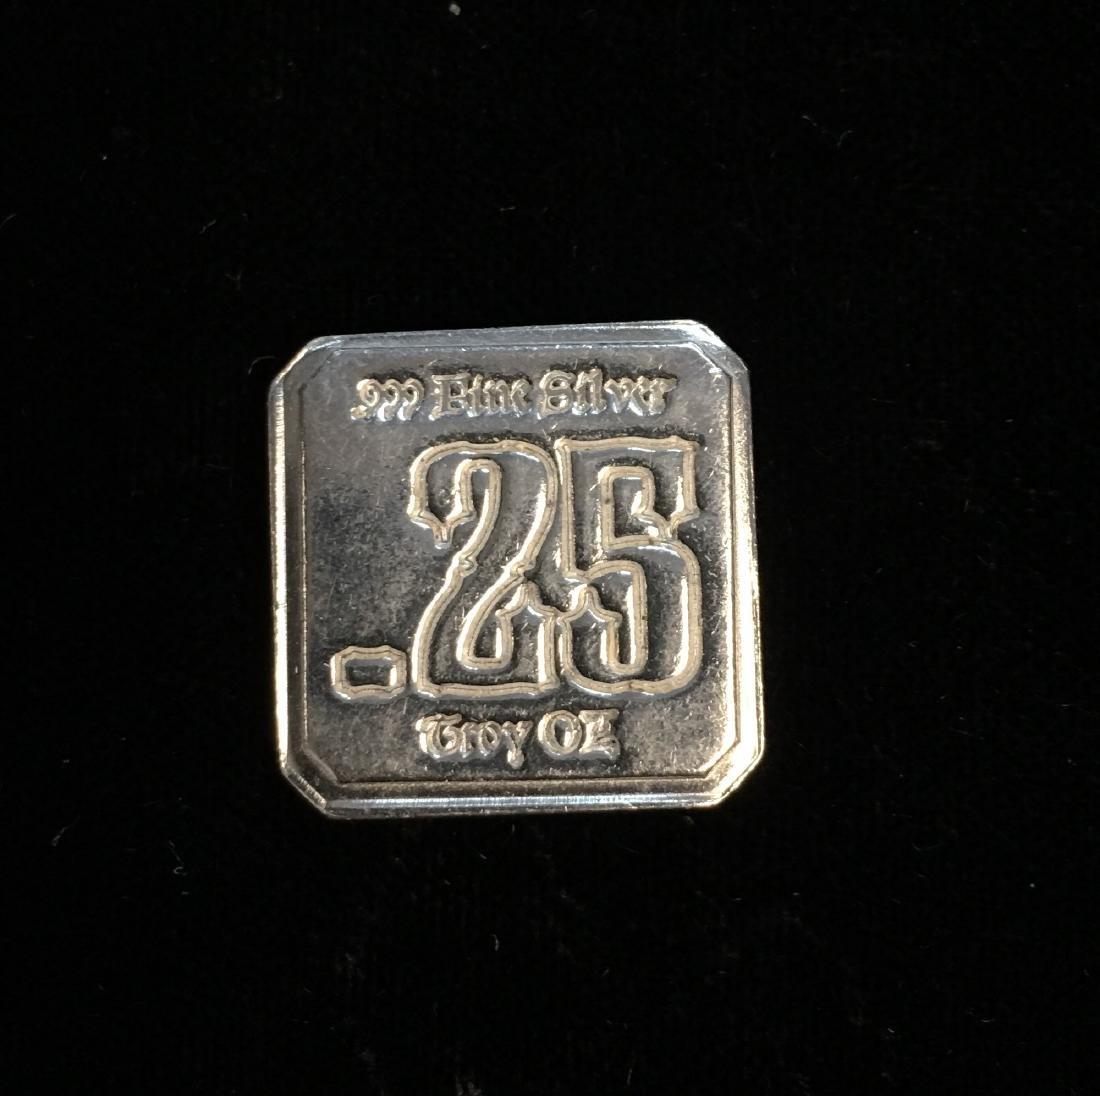 Suns of Liberty Mint 0.25 tr oz .999 Fine Silver